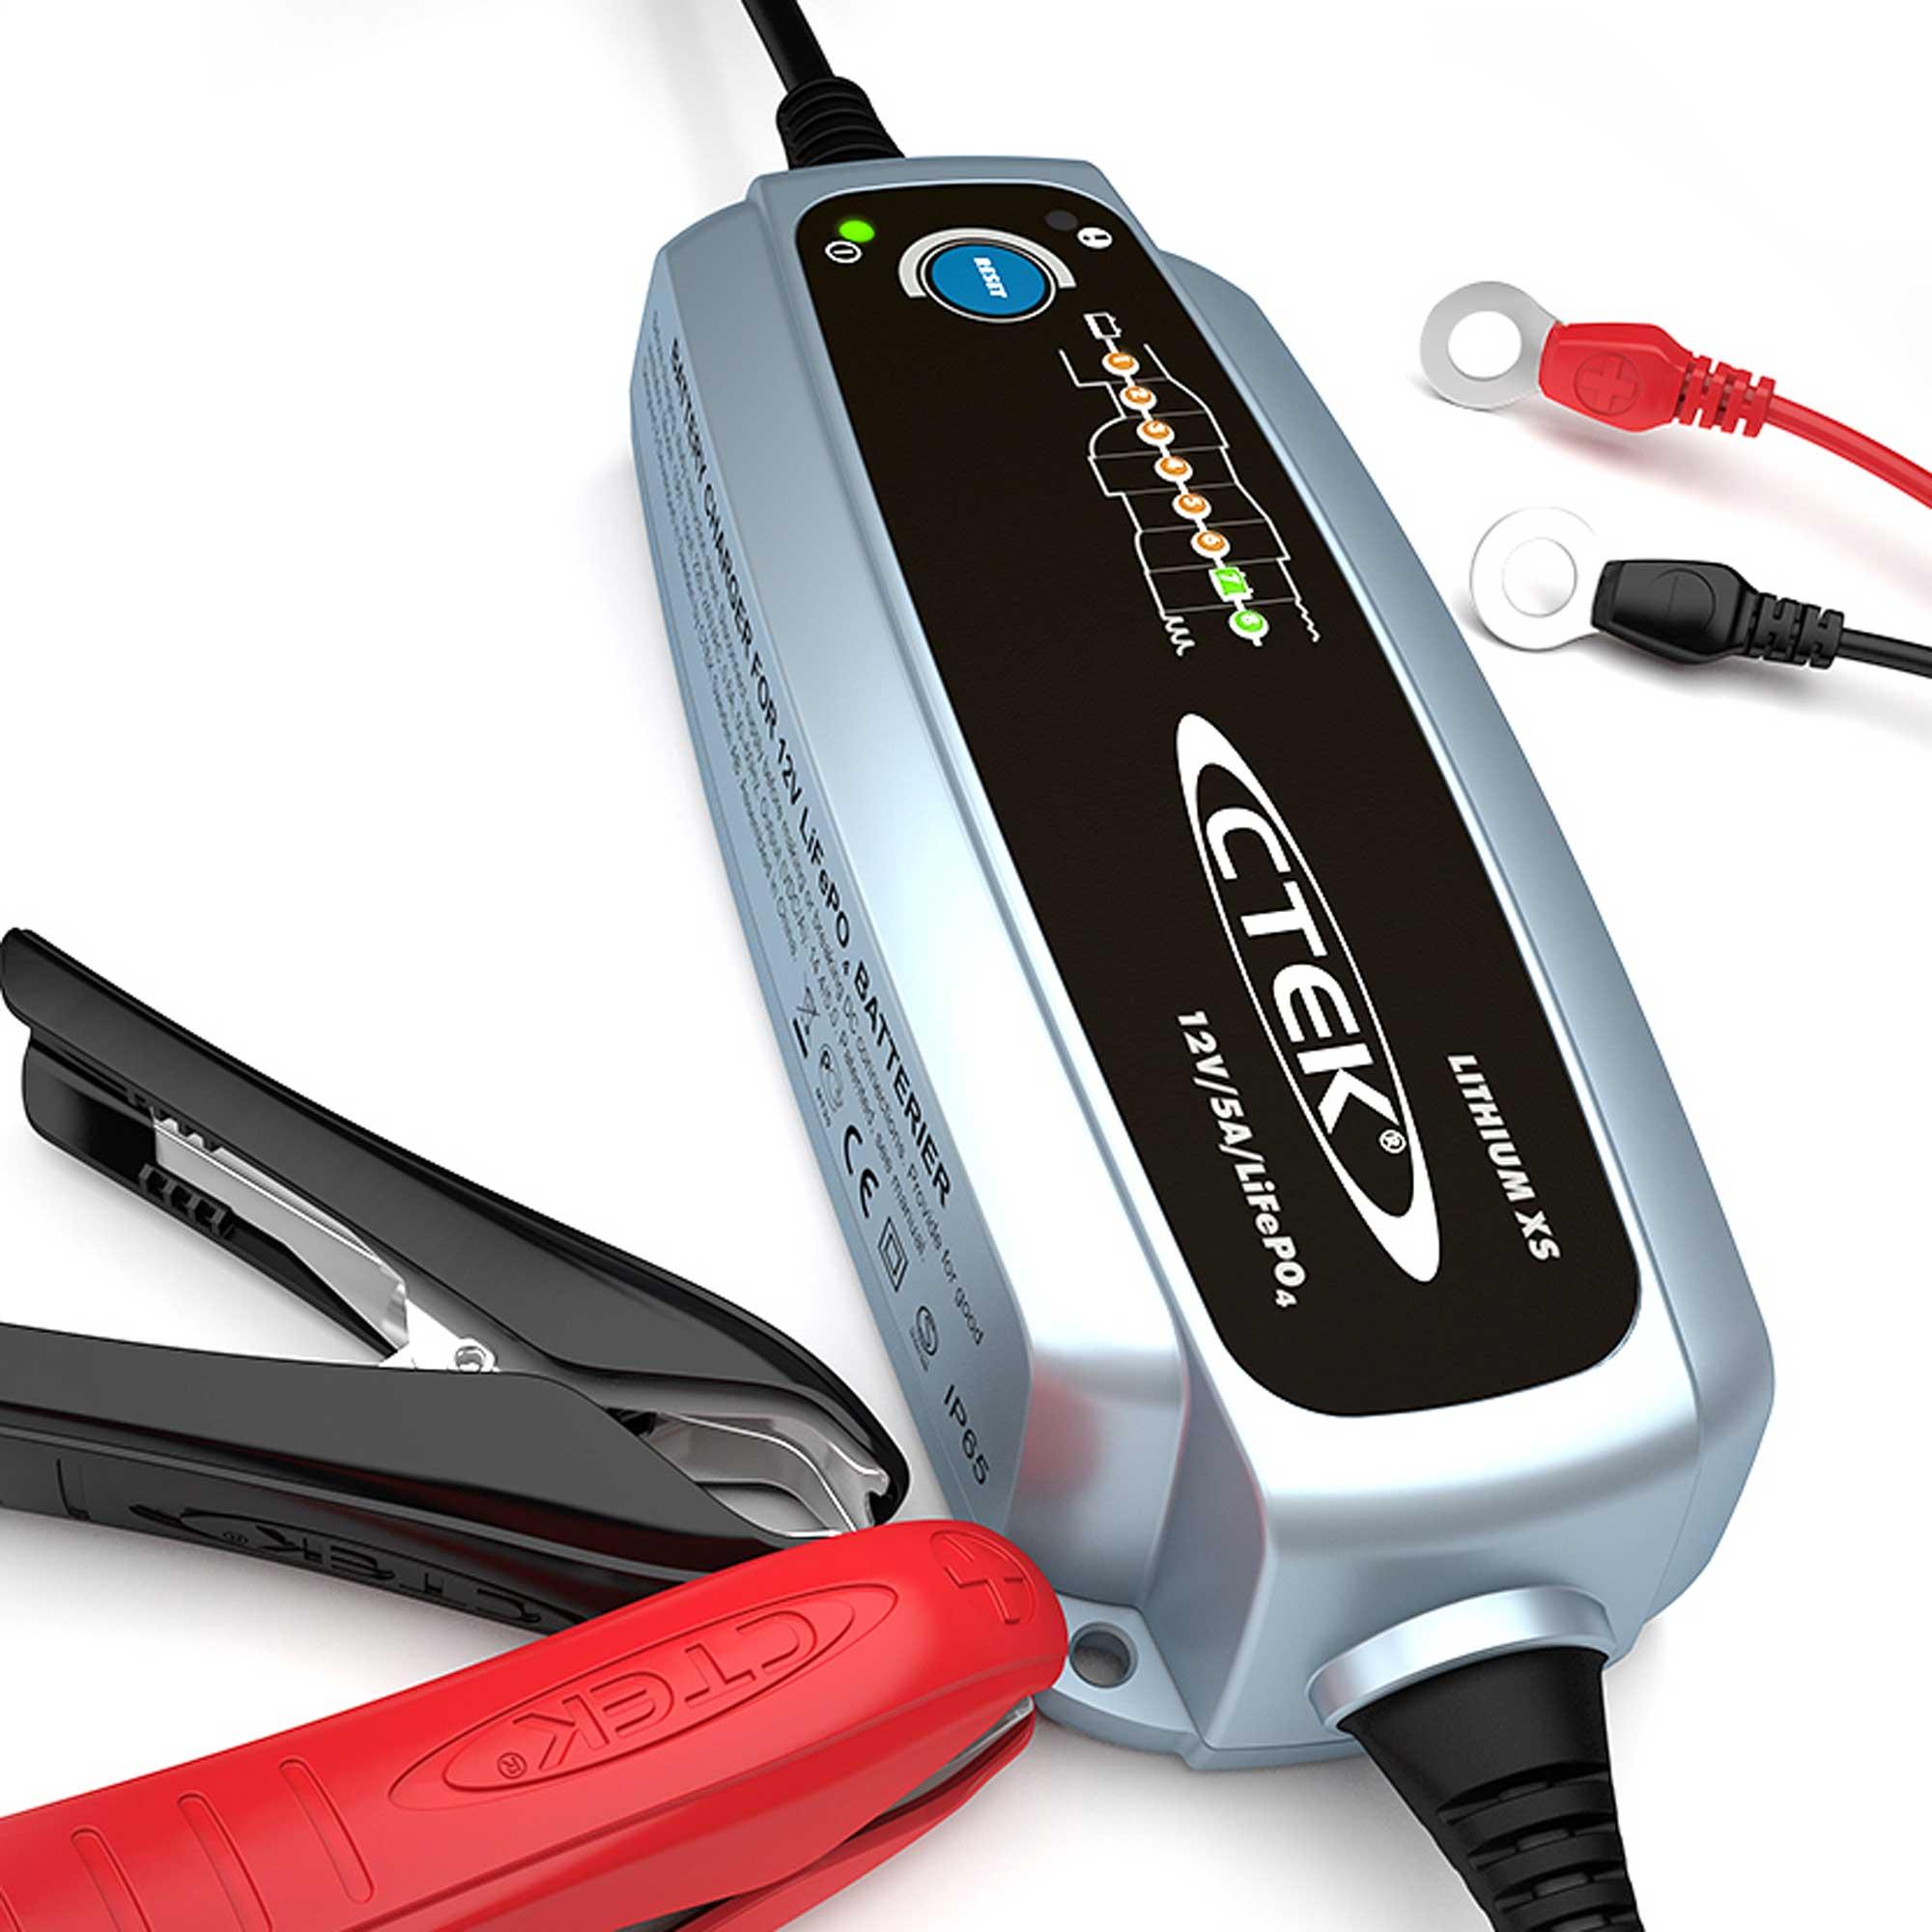 Зарядное устройство Ctek LITHIUM XS (+ Антисептик-спрей для рук в подарок!) зарядное